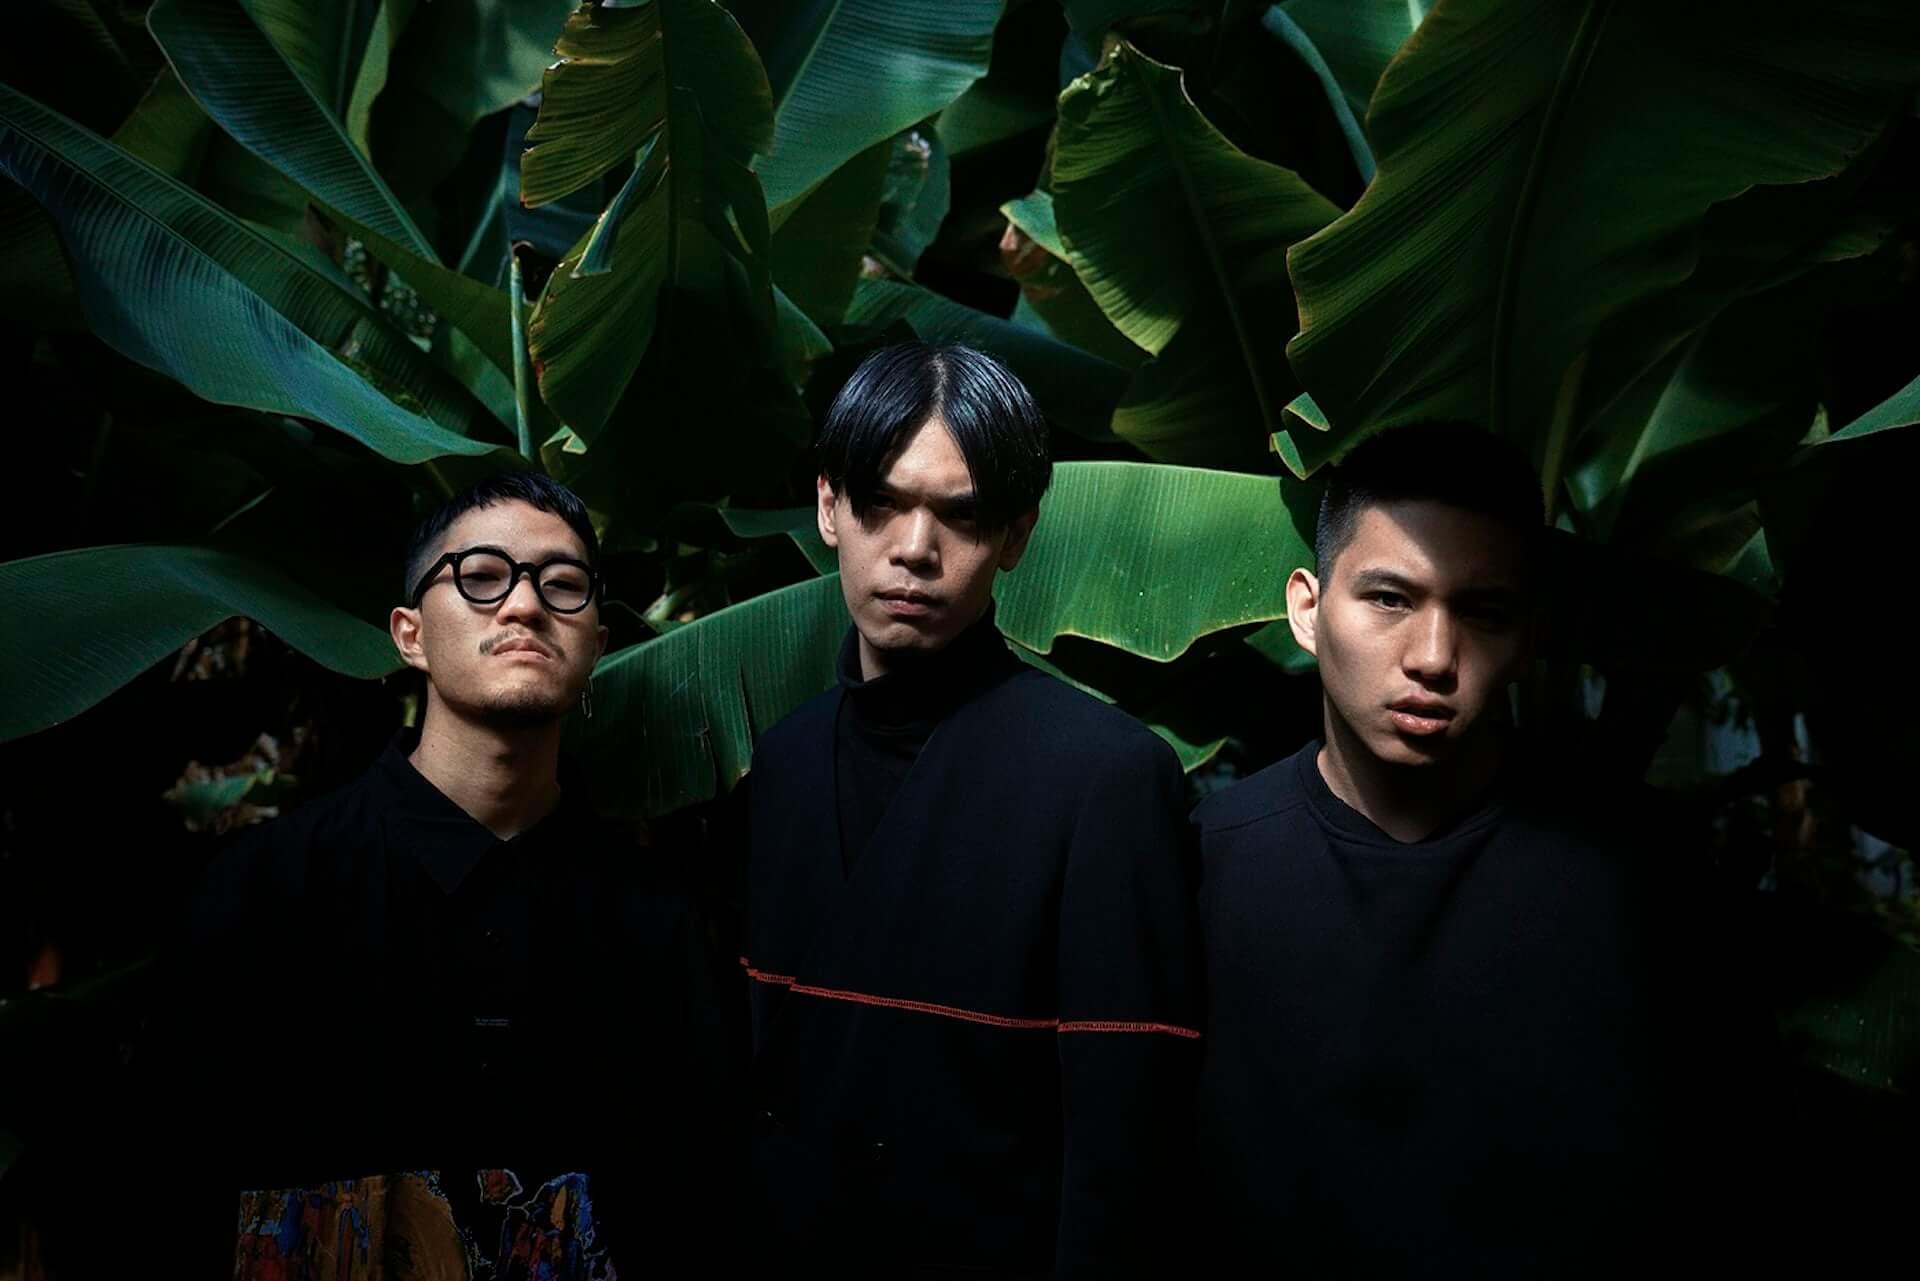 Dos Monosの新アルバム『Dos Siki』のトラックリストが公開!Injury Reserveをフィーチャーした楽曲も収録 music200714_dosmonos_2-1920x1281